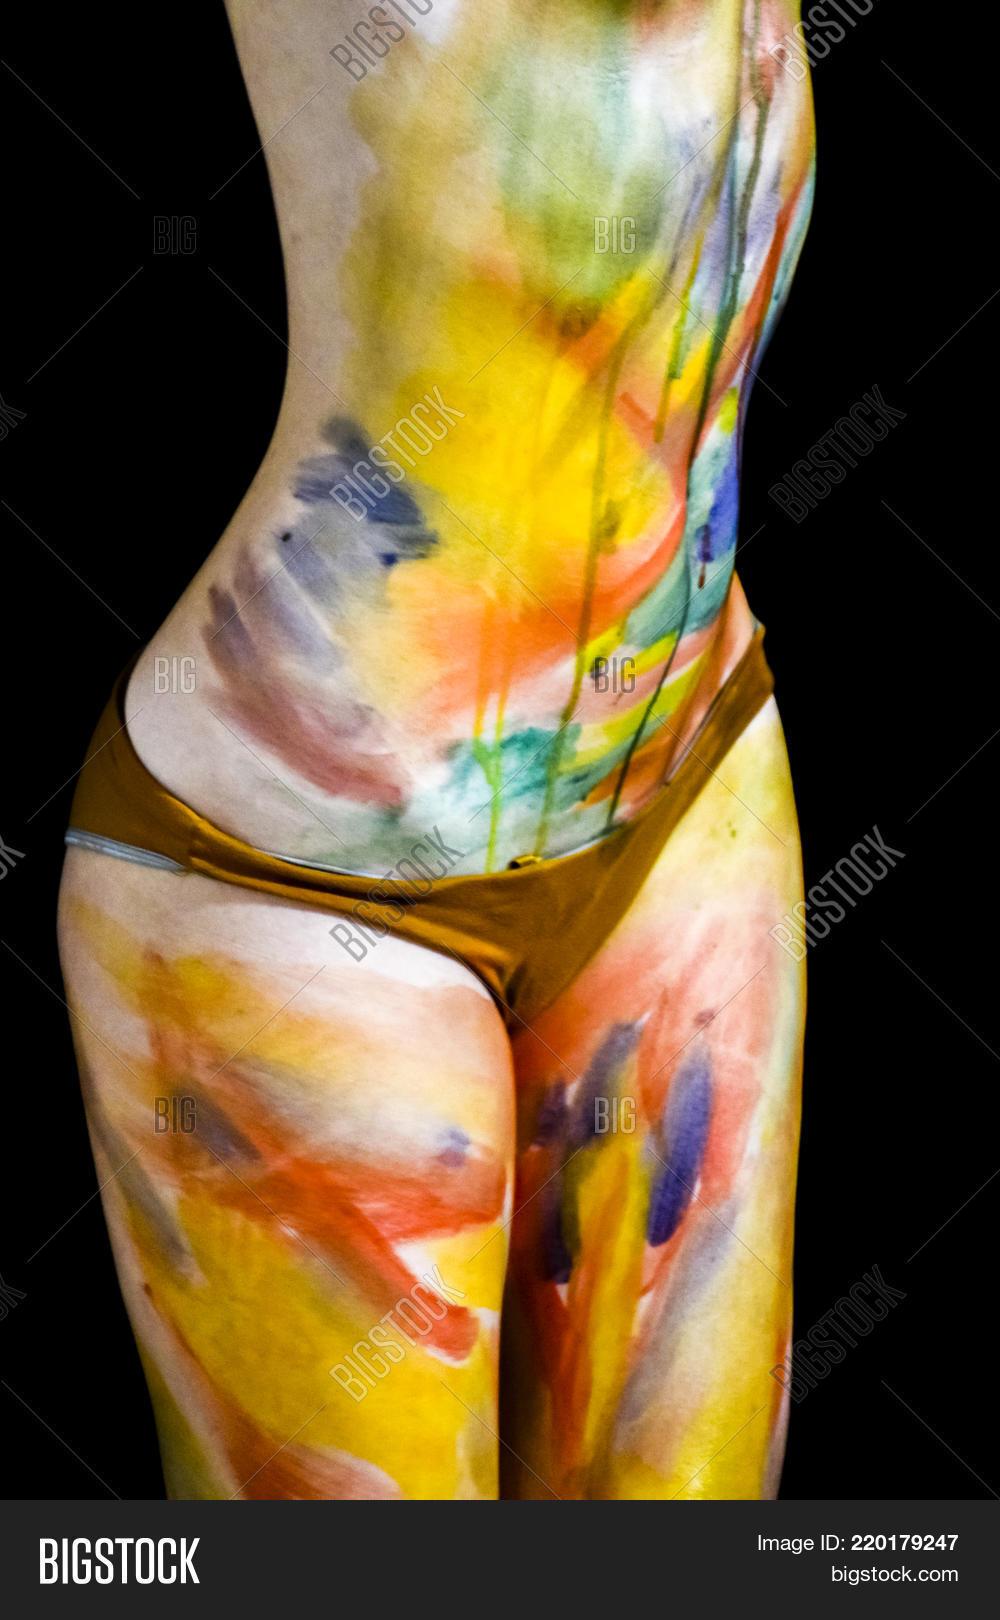 Body Art Drawing On Image Photo Free Trial Bigstock